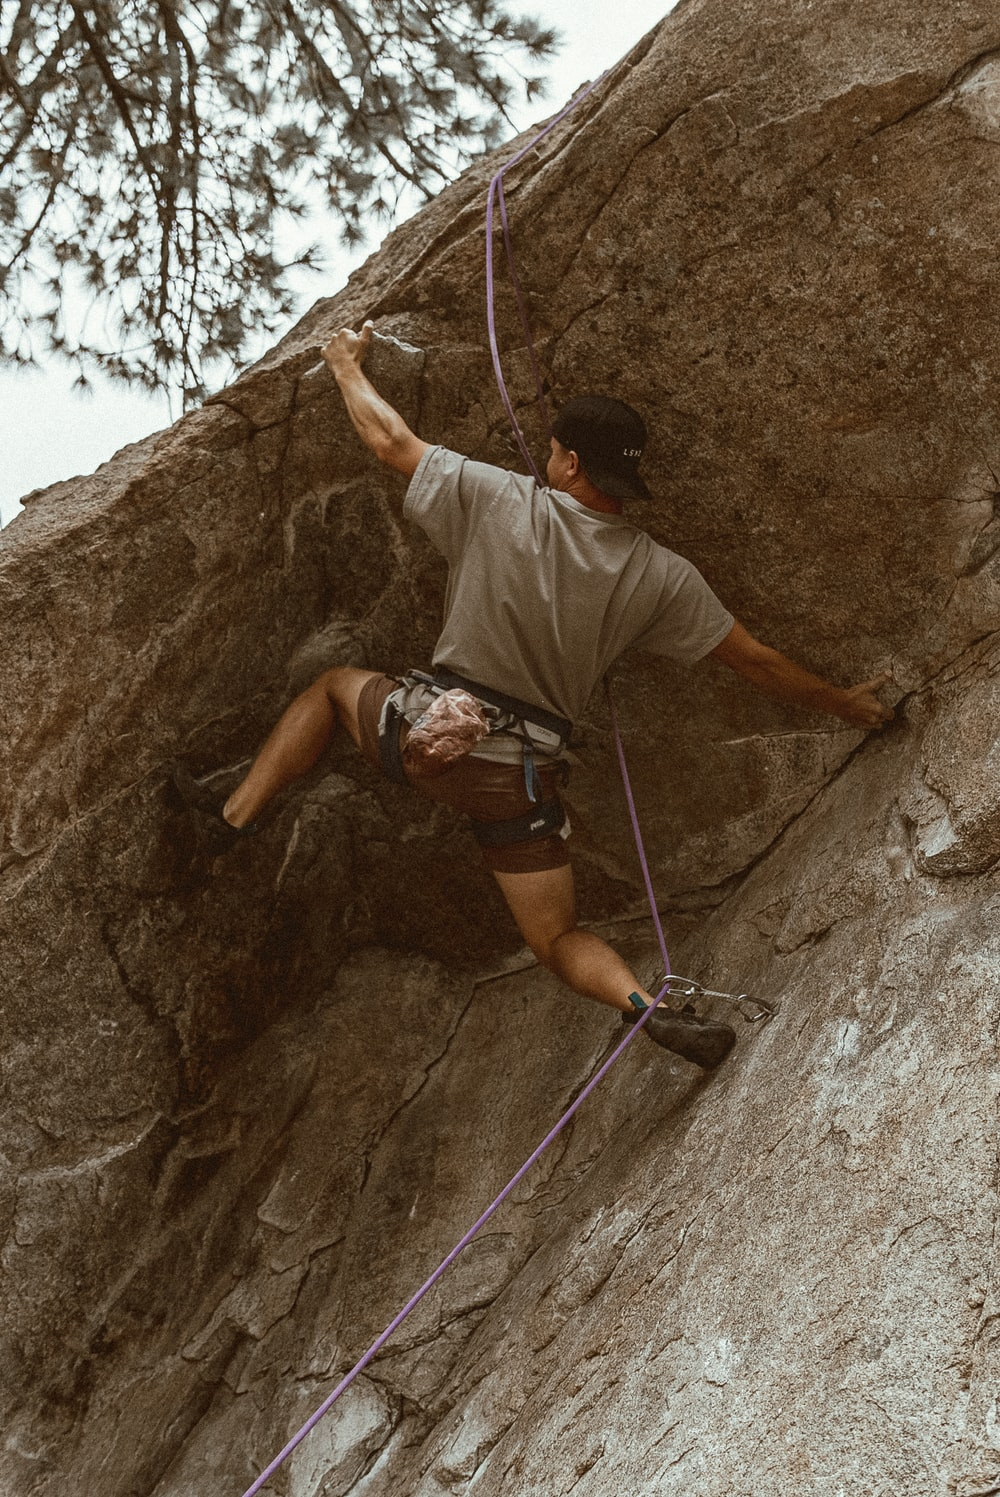 man in white t-shirt climbing on rocky mountain during daytime